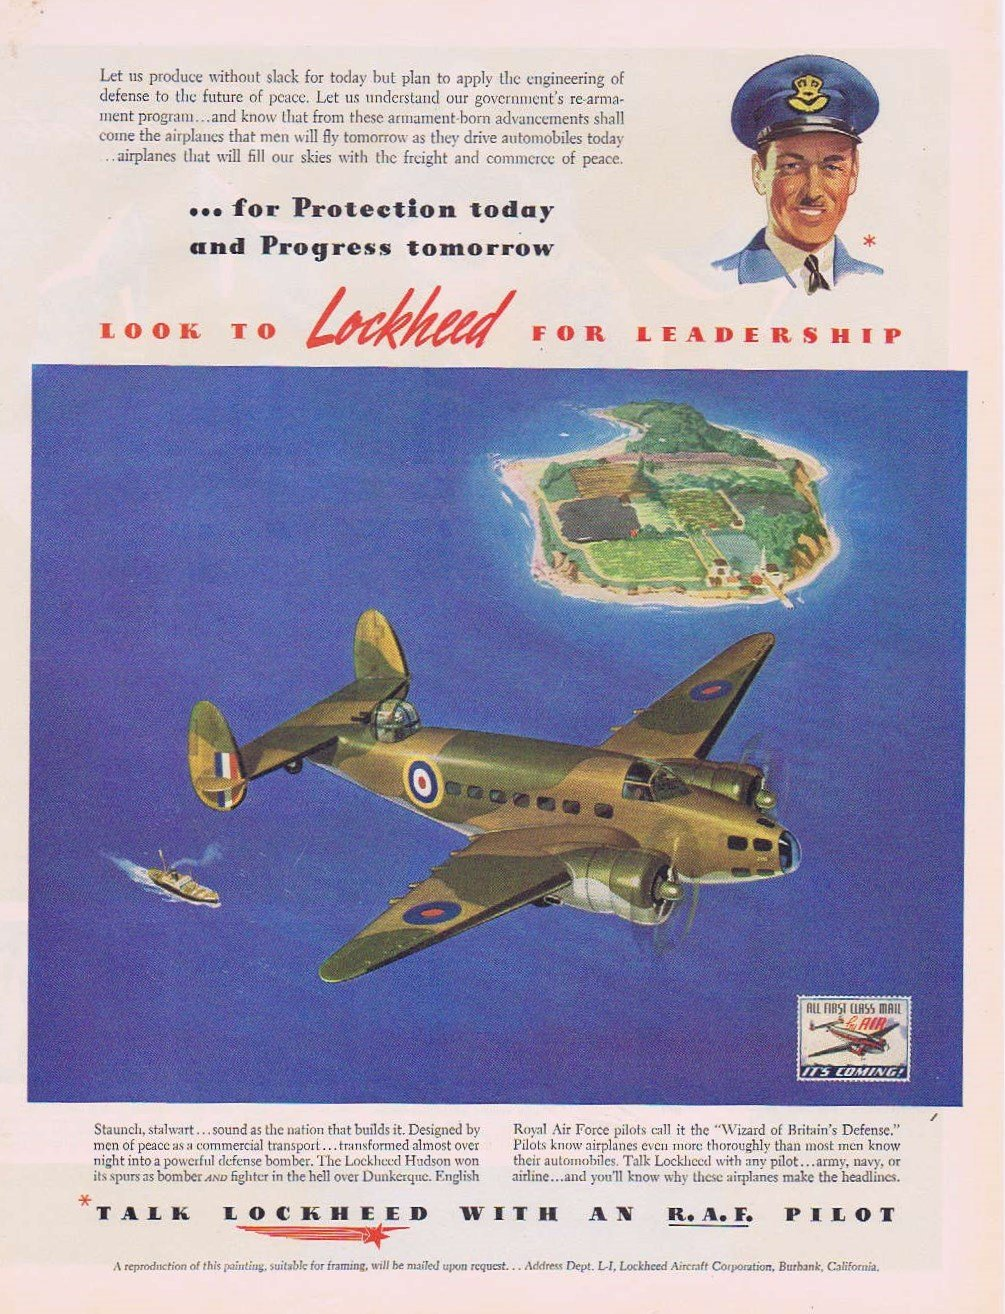 1941 Lockheed Hudson Bomber Military Plane Original Vintage Advertisement